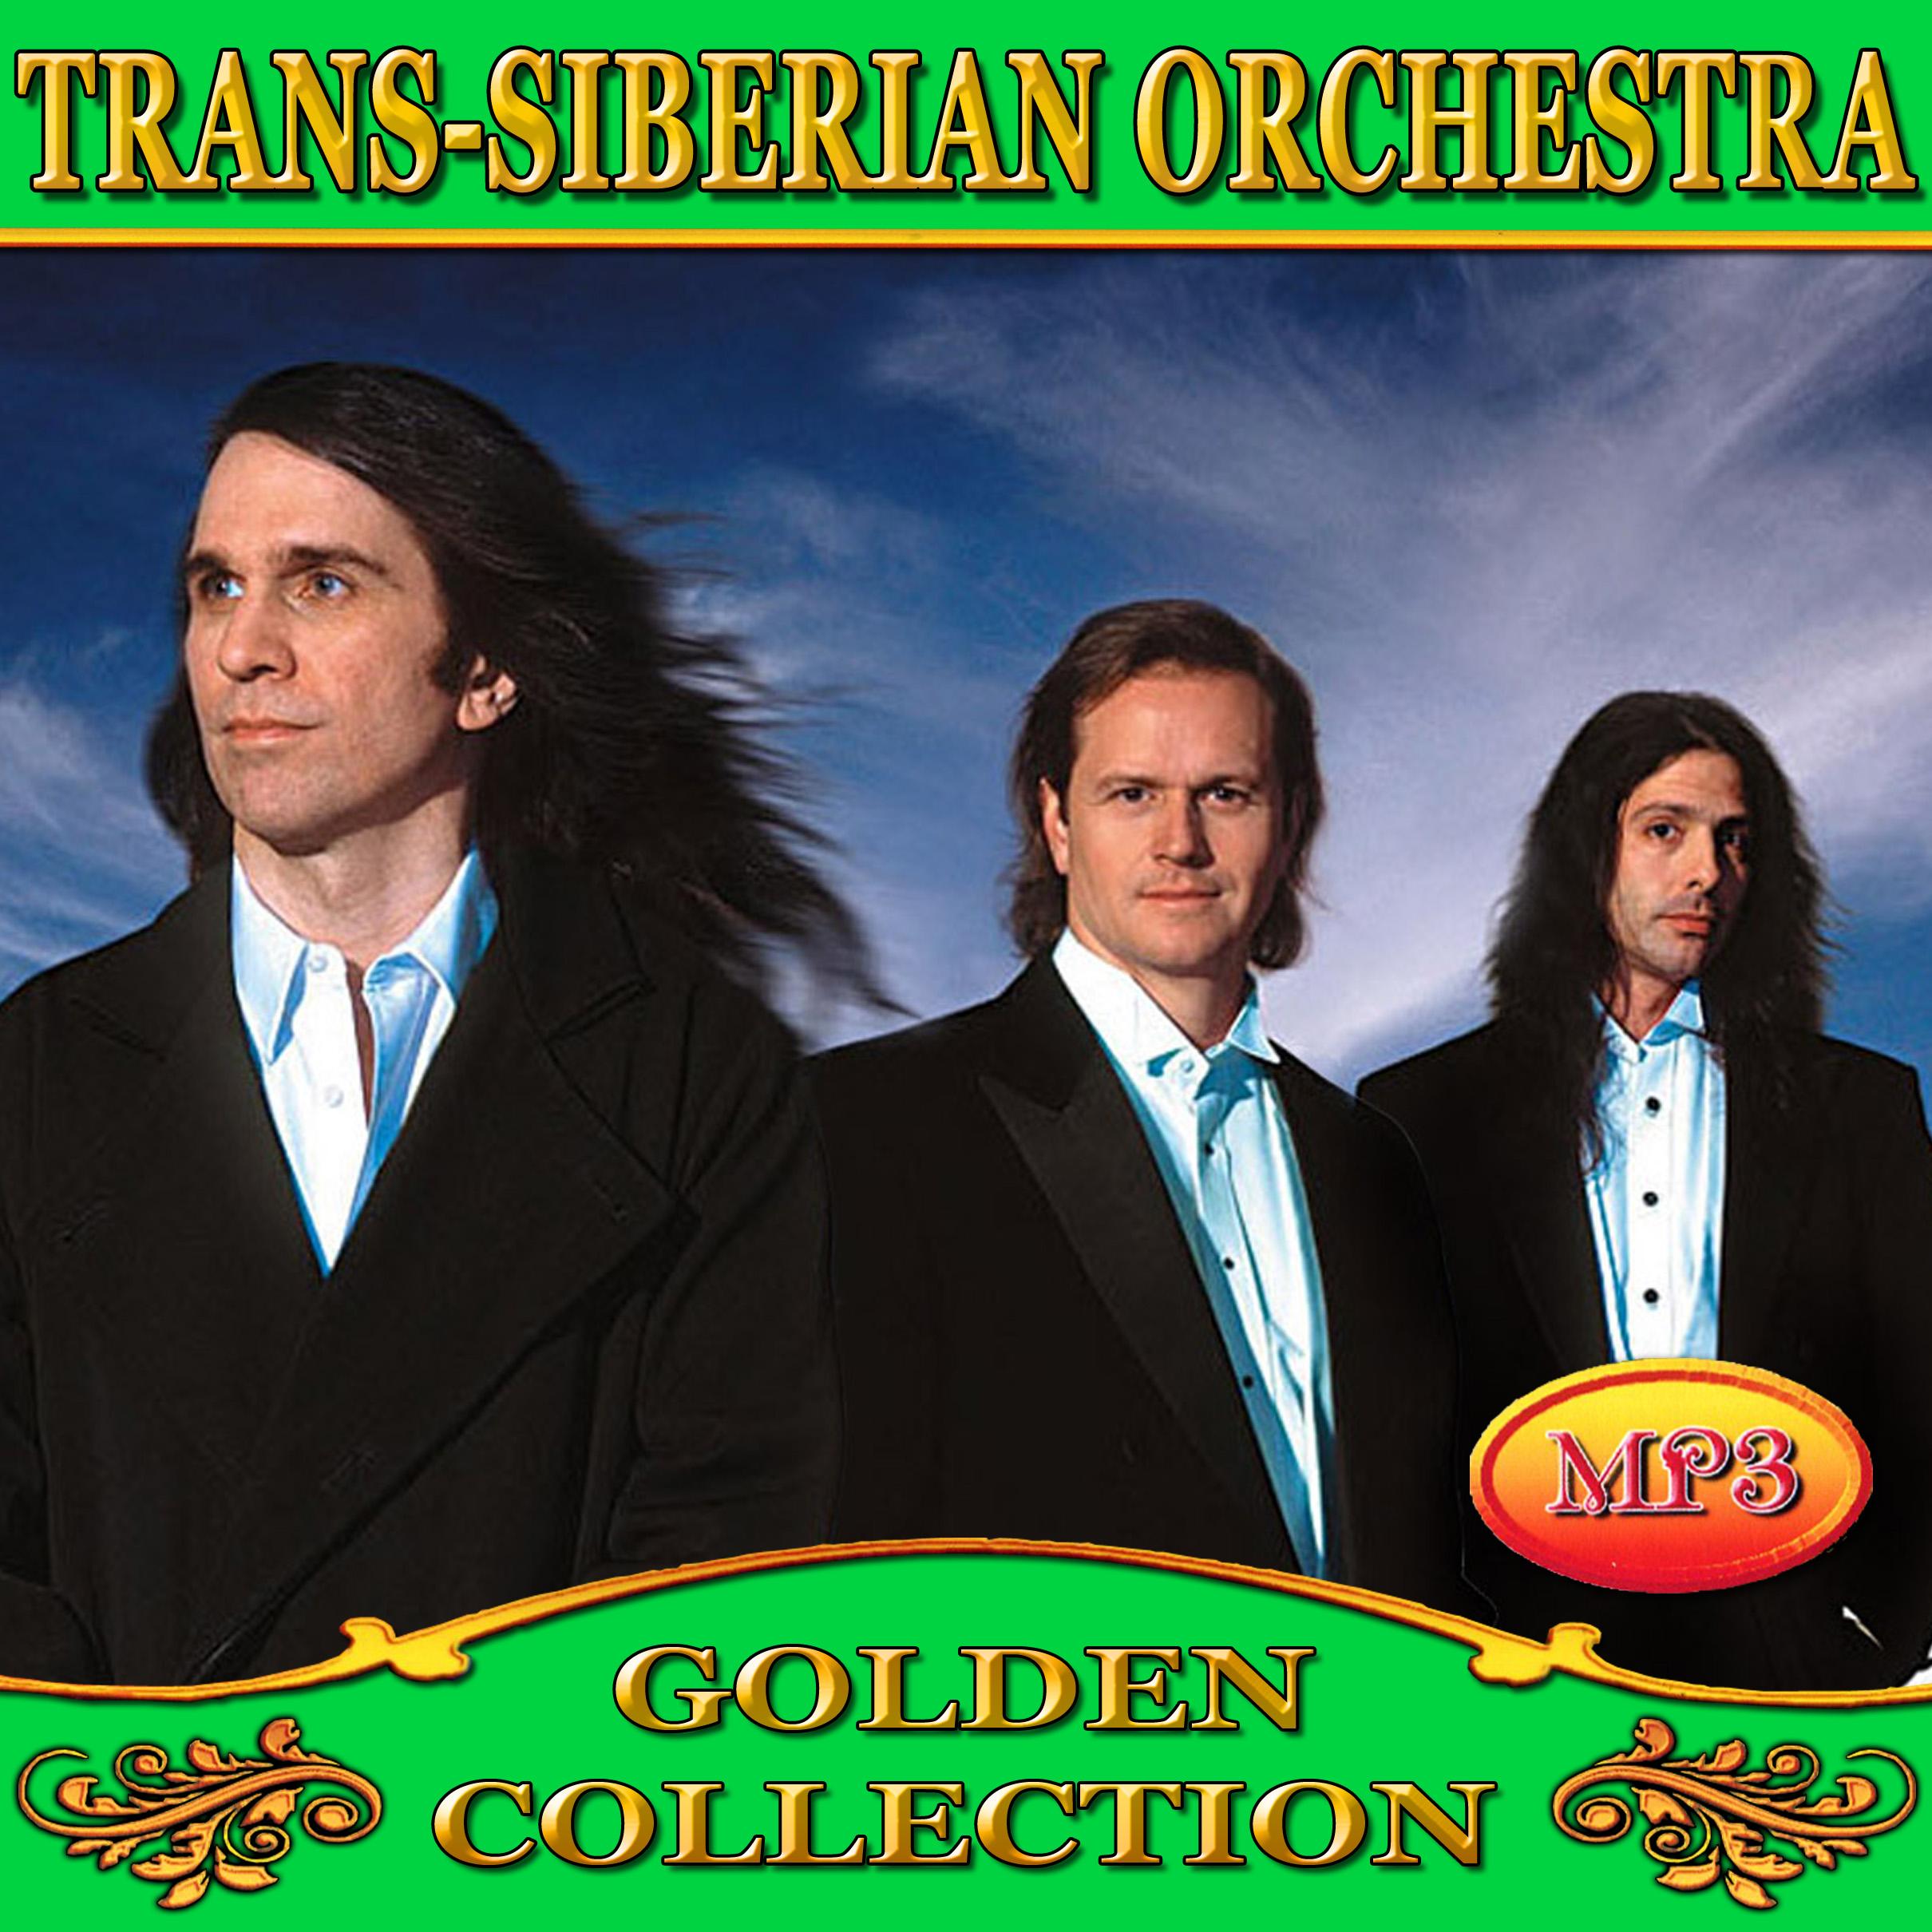 Trans-Siberian Orchestra [mp3]